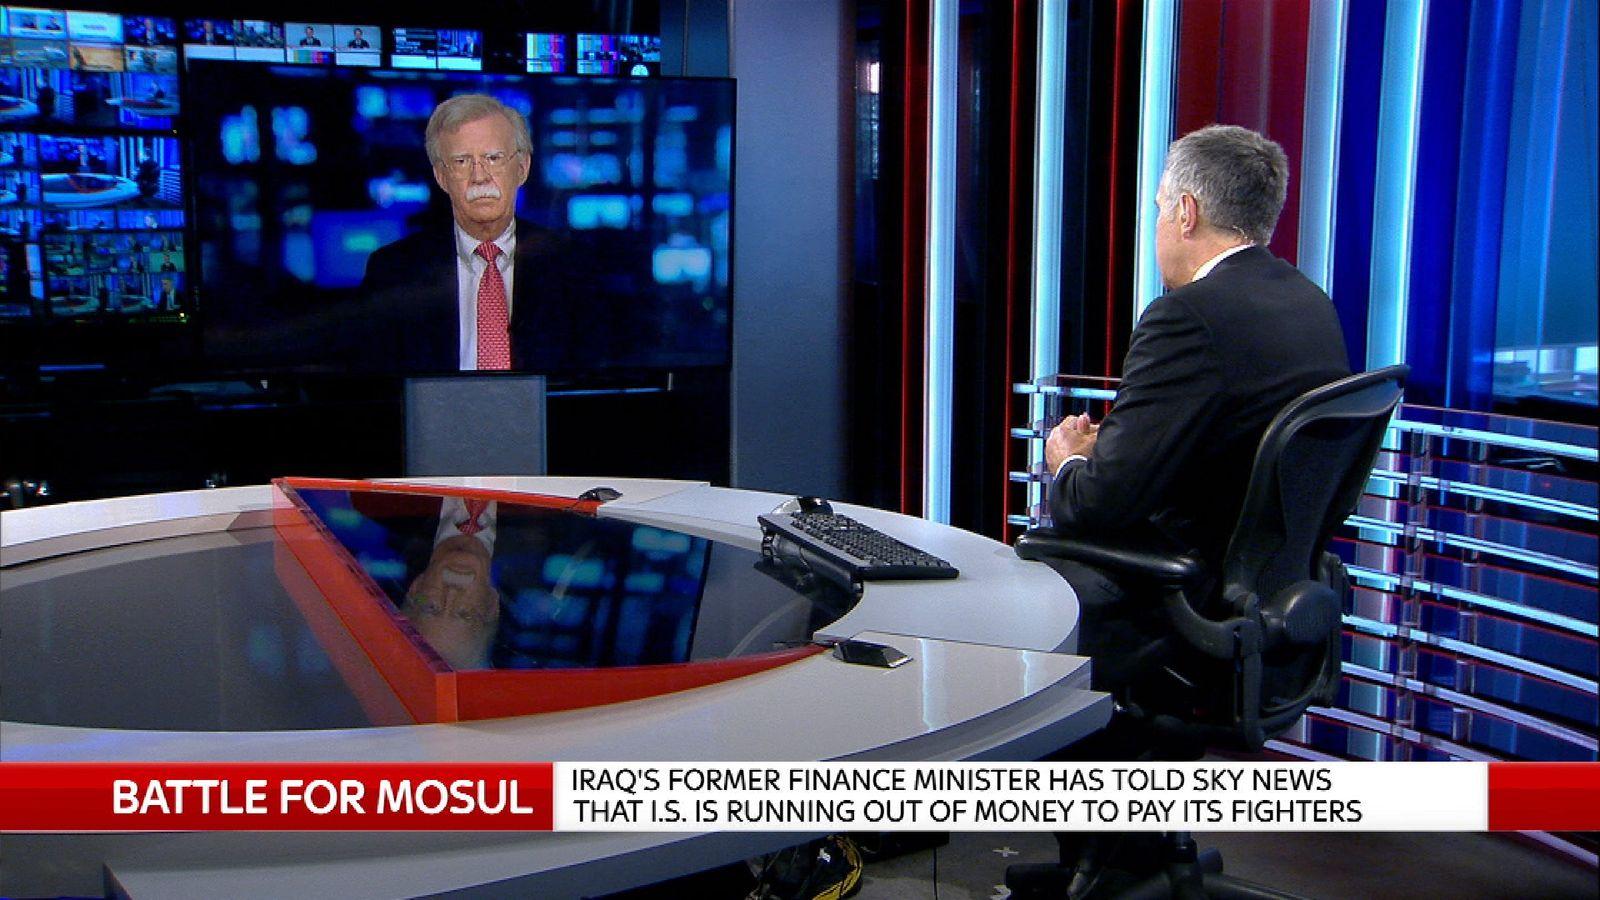 Former US Ambassador to the UN John Bolton being interviewed by Sky's Dermot Murnaghan